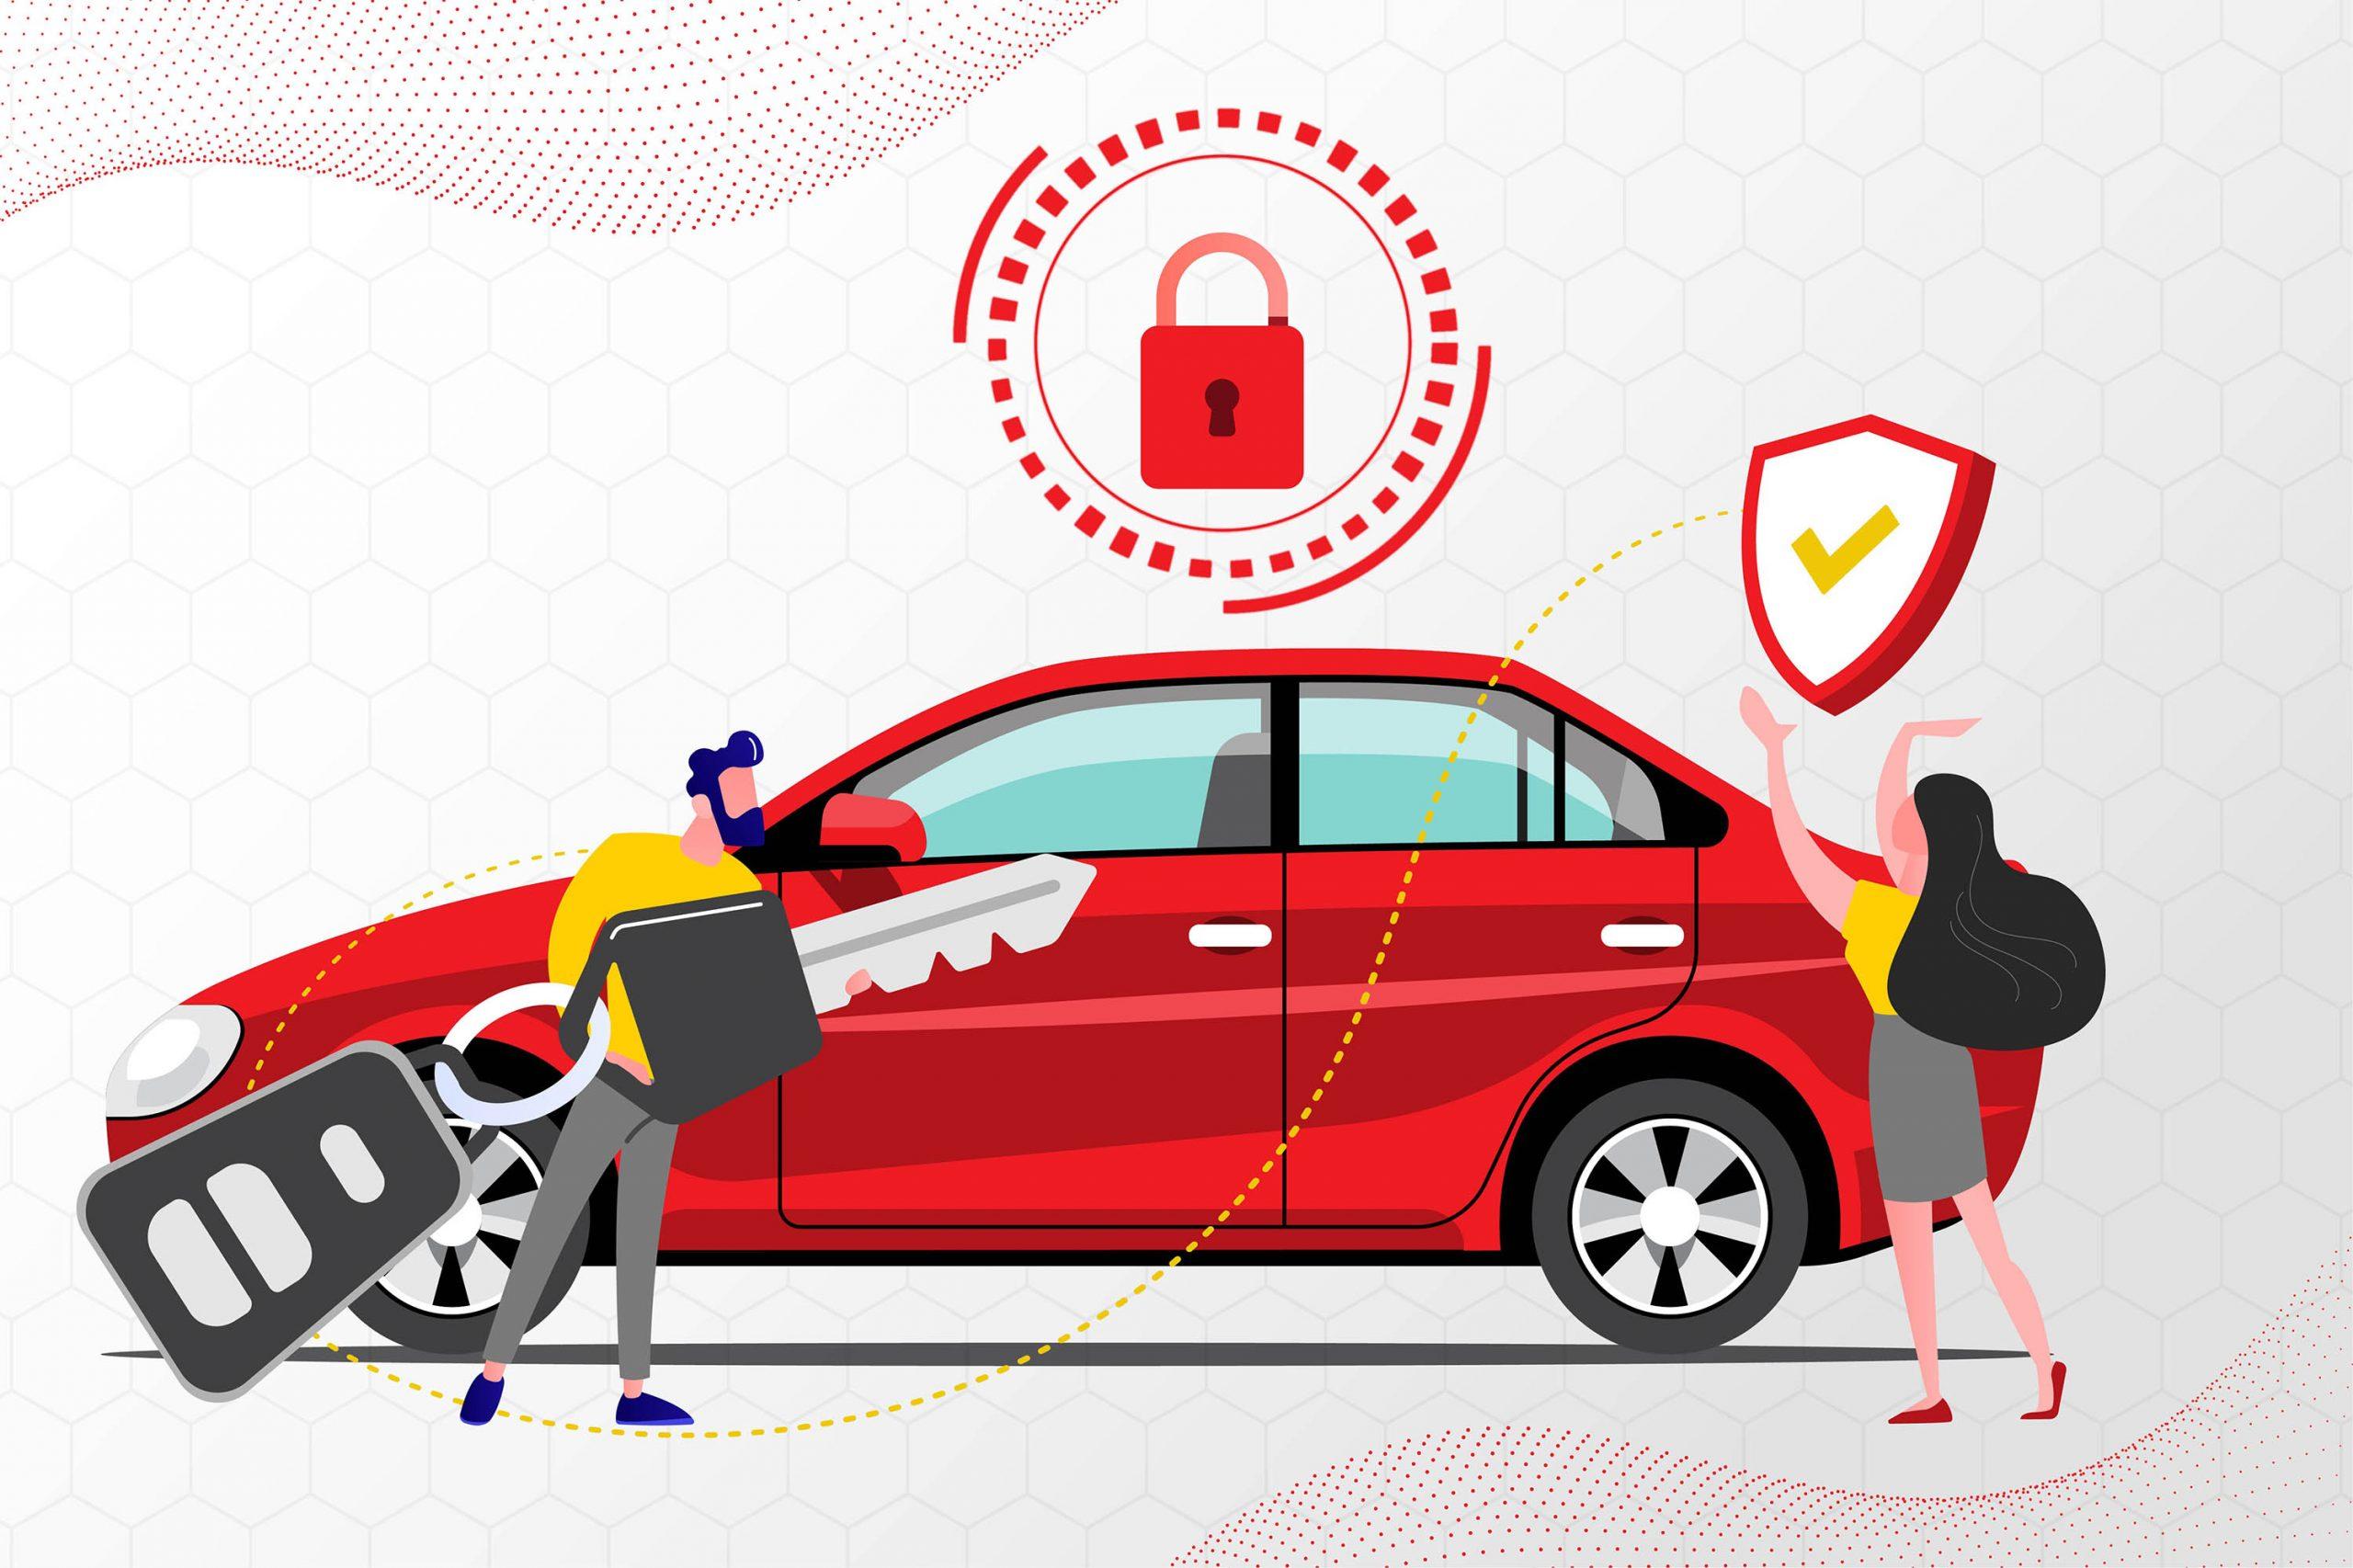 Sistem Keamanan Canggih Mobil Zaman Now